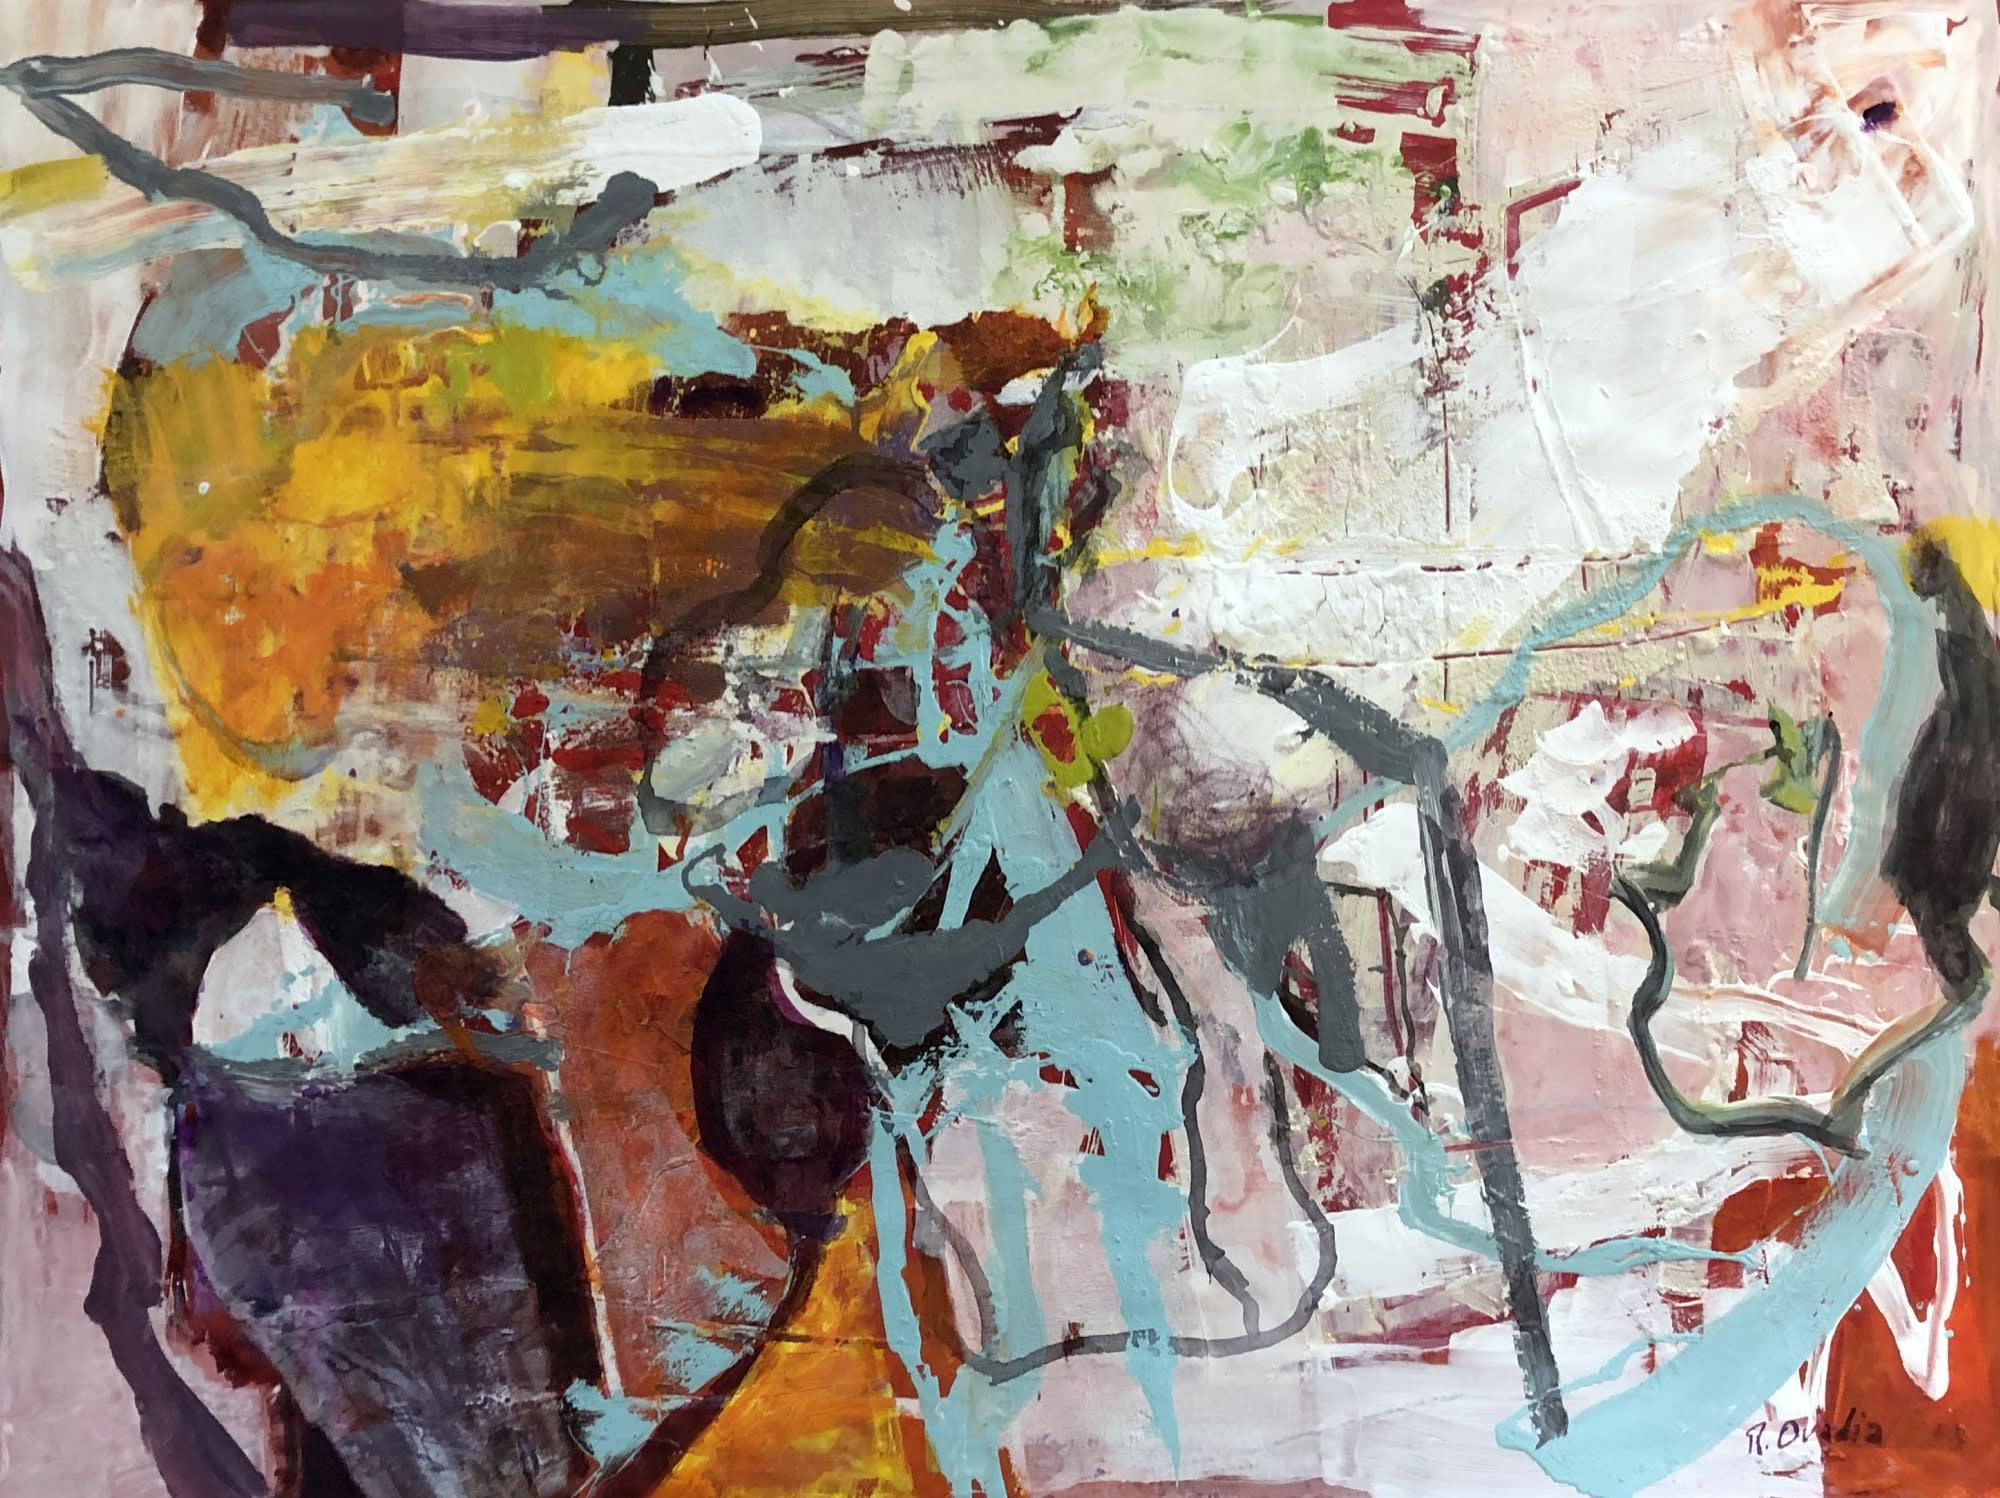 'Magenta' by Rachel Ovadia at Gallery 133